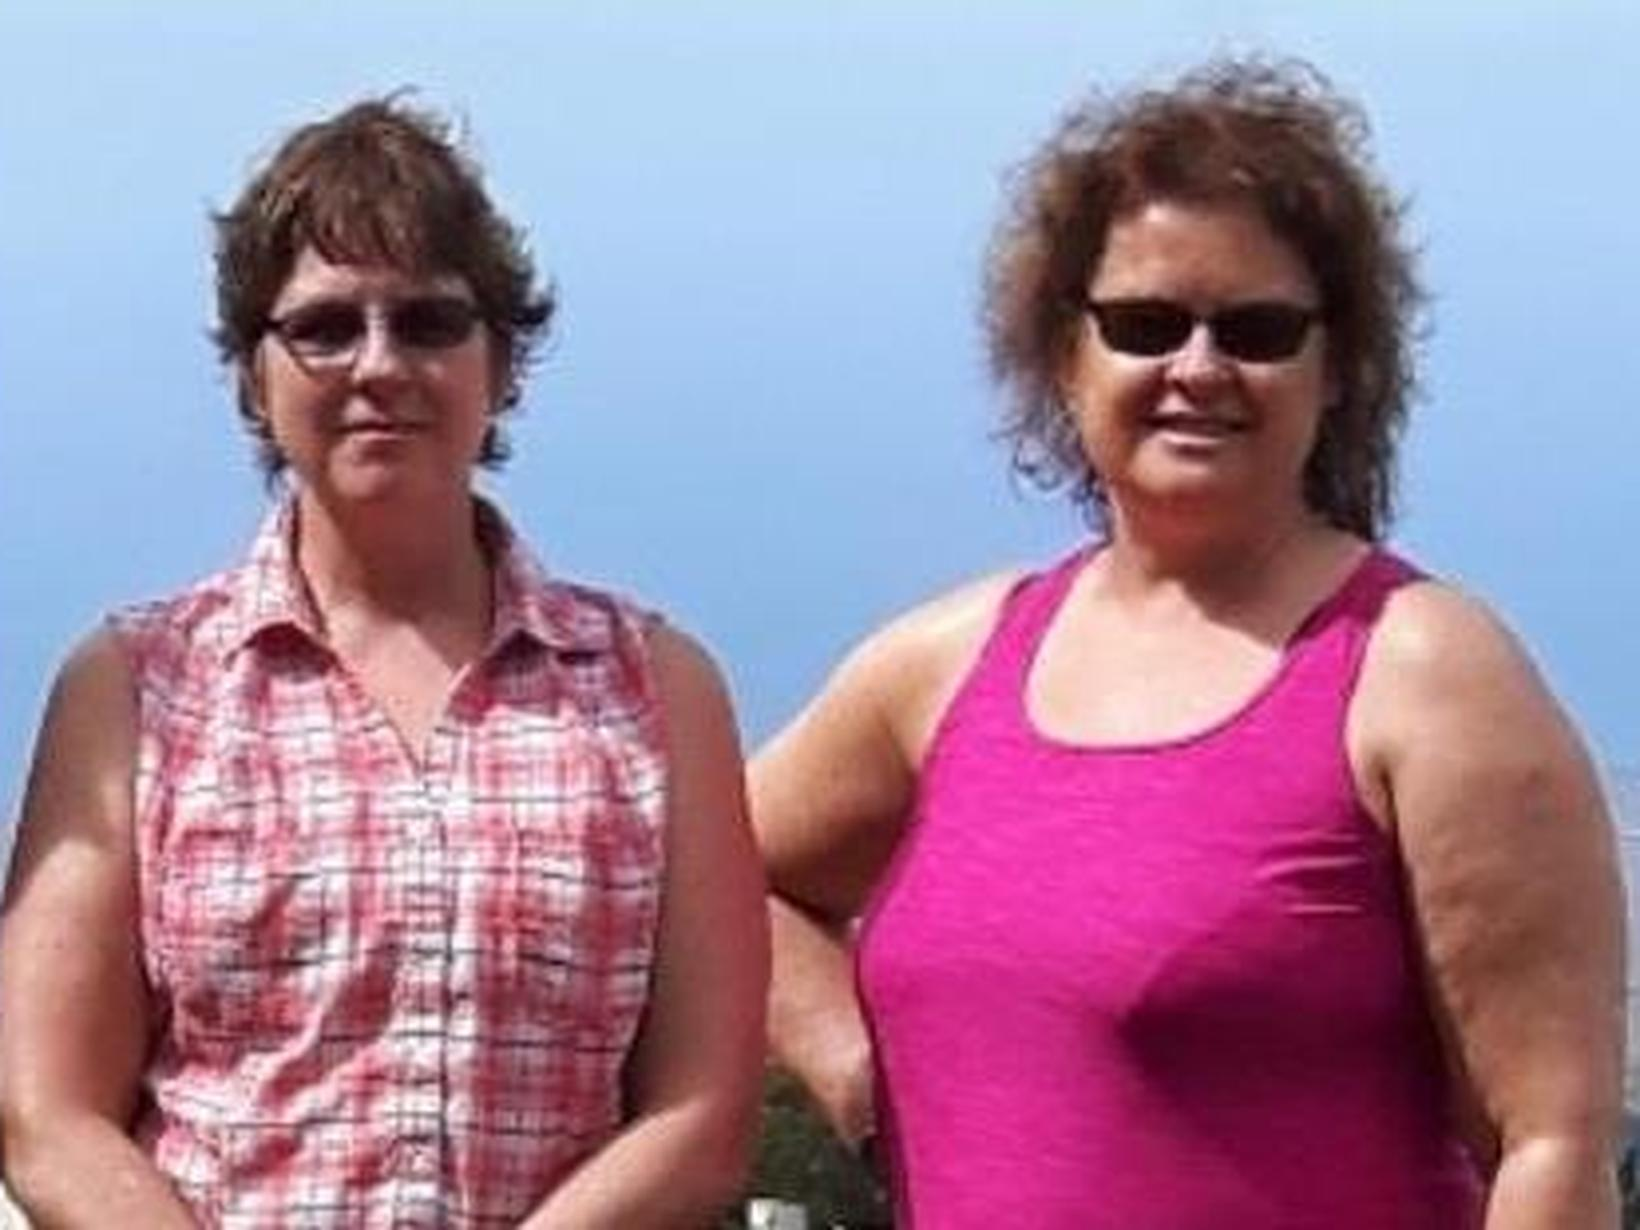 Katherine & Susan from Surrey, British Columbia, Canada